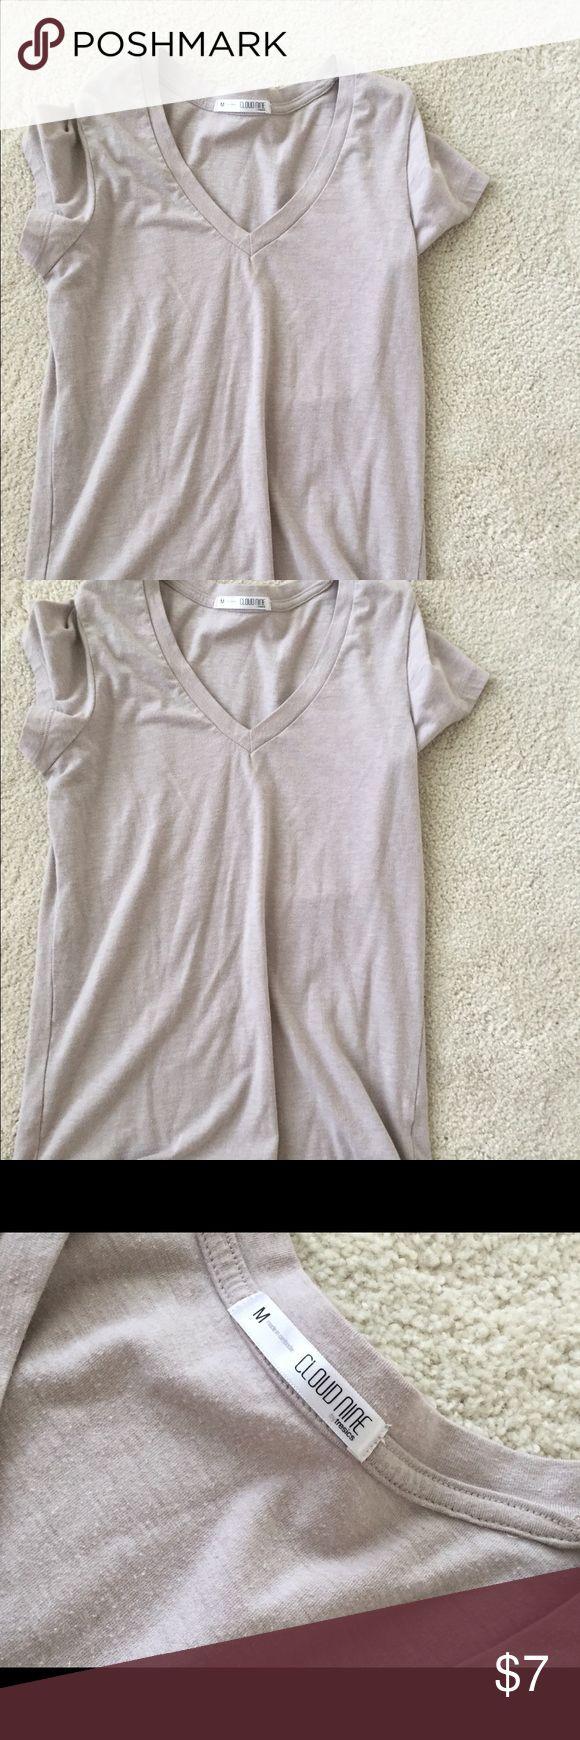 Beige tee shirt Beige tee shirt. Size M. Cloud 9 Tops Tees - Short Sleeve